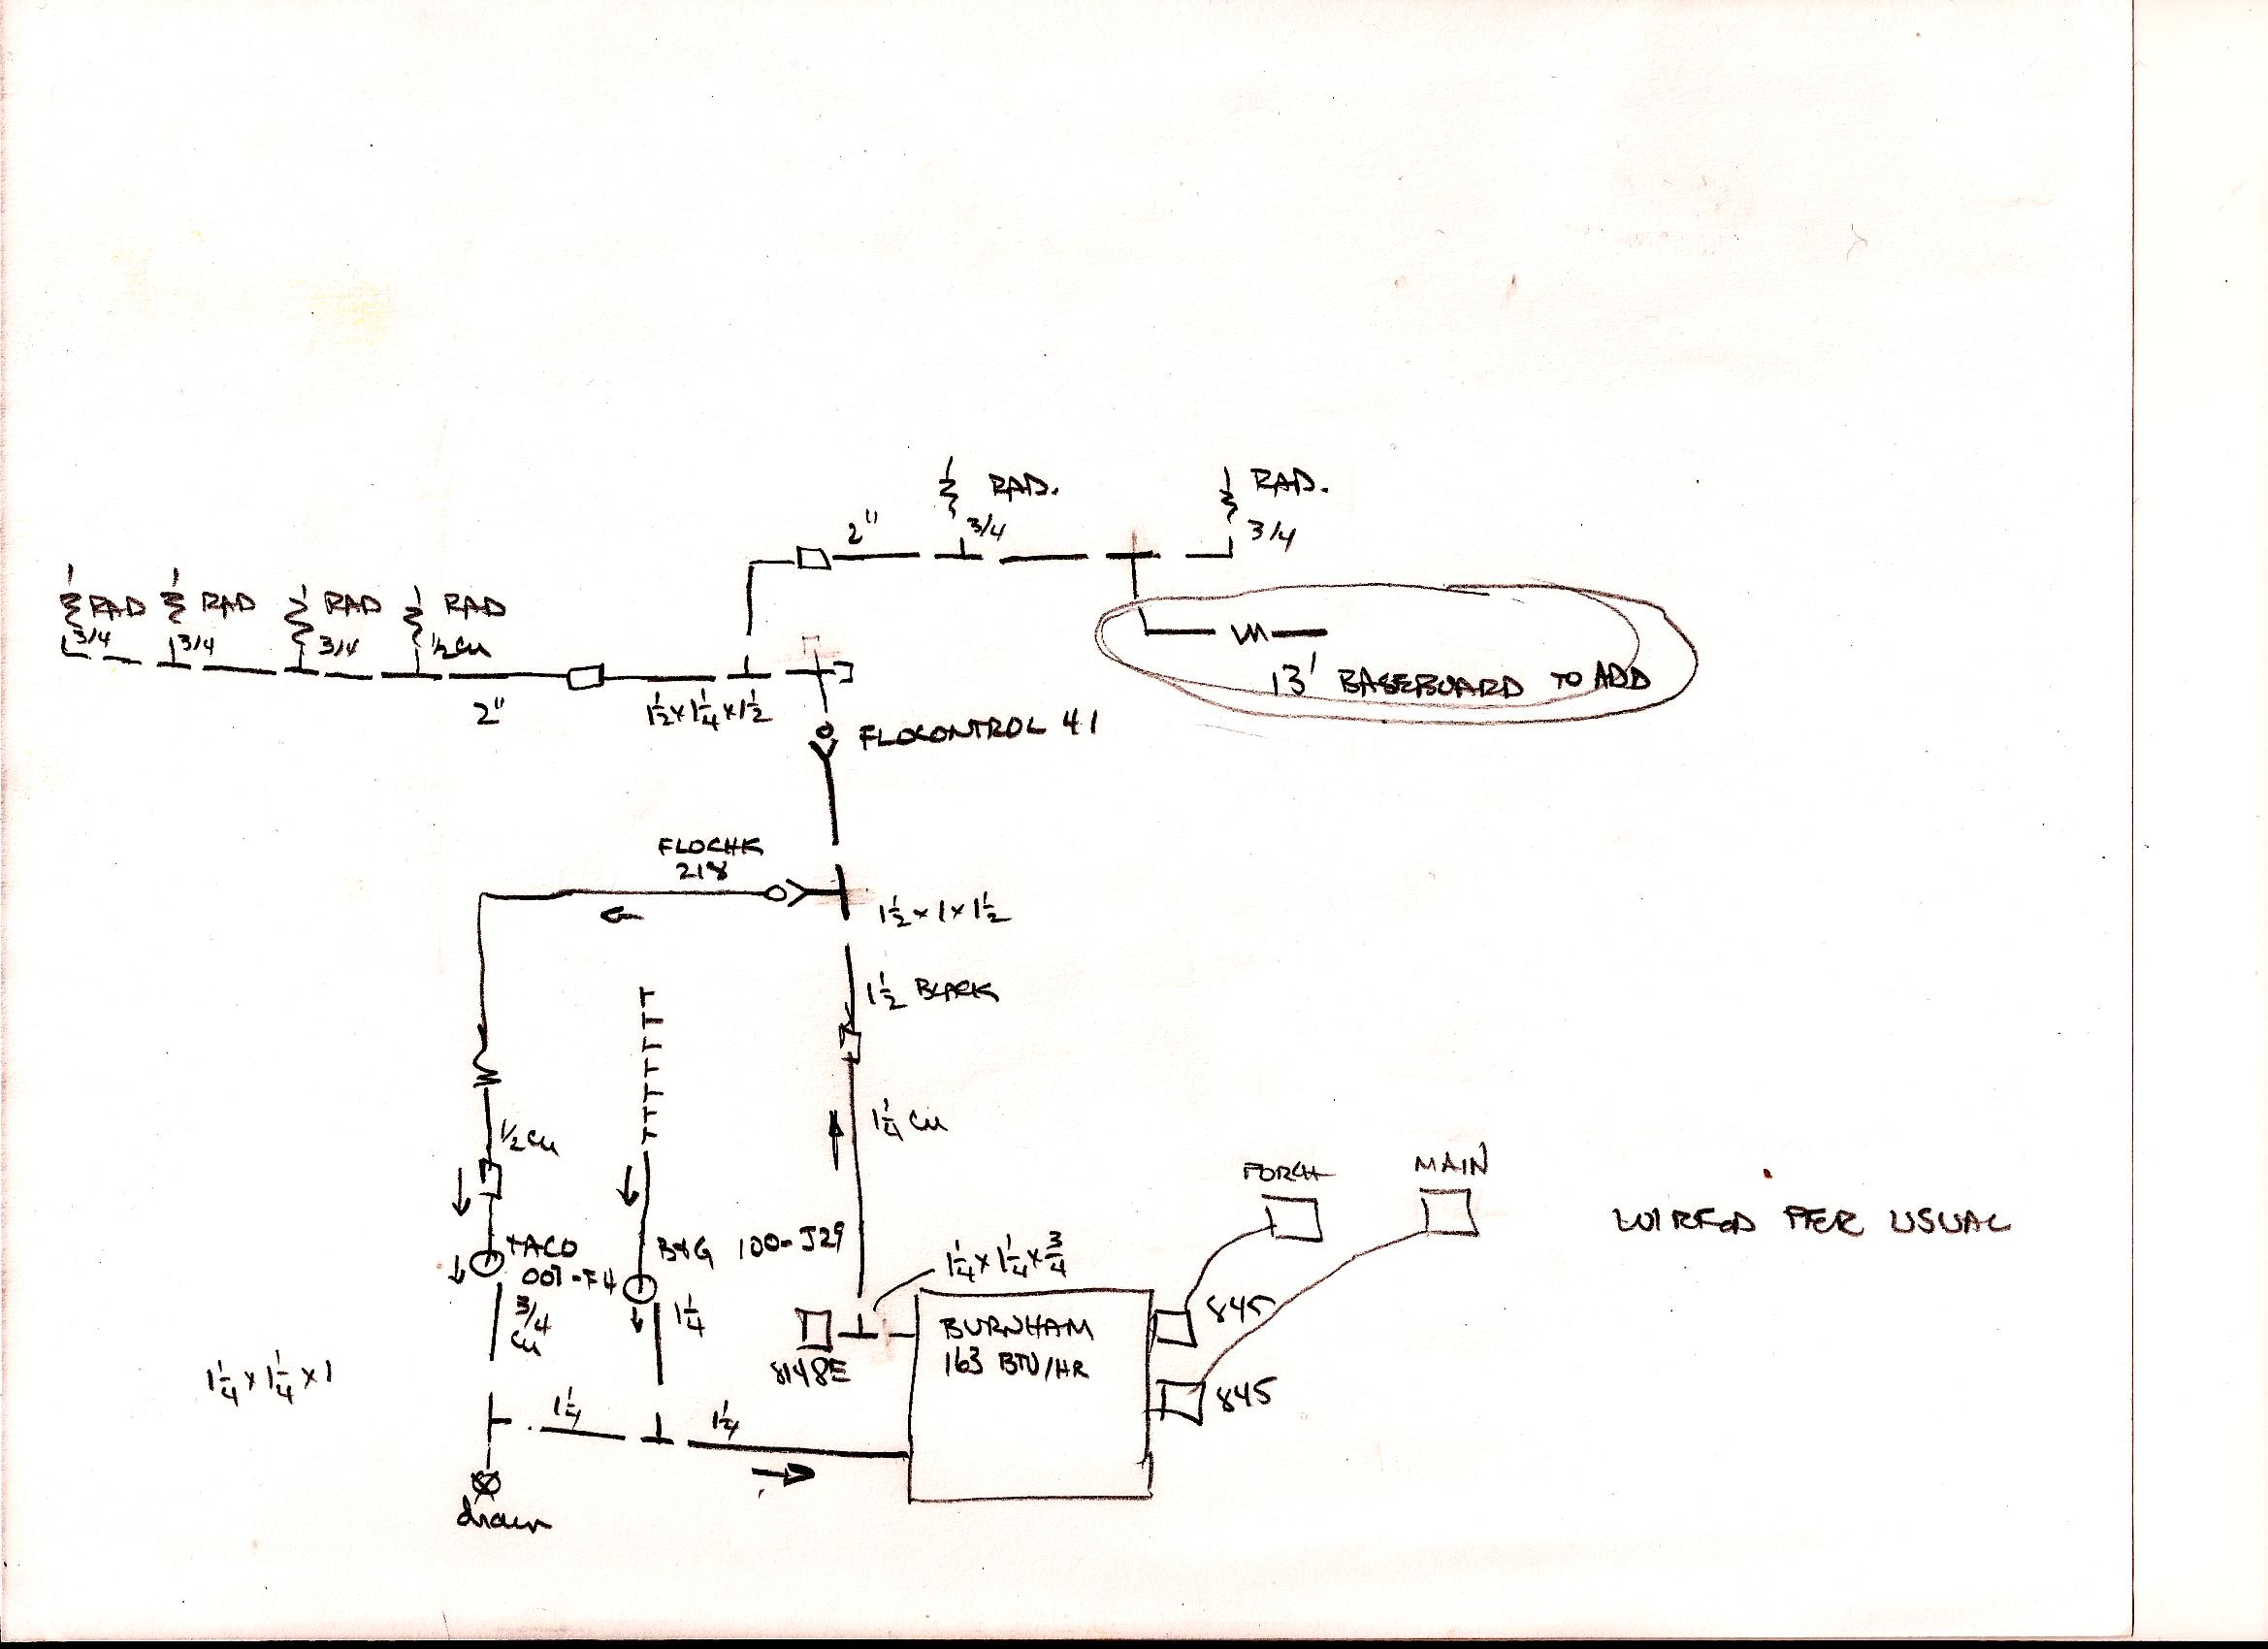 honeywell v8043e1012 wiring diagram | wiring diagram on honeywell  zoning wiring-diagram,